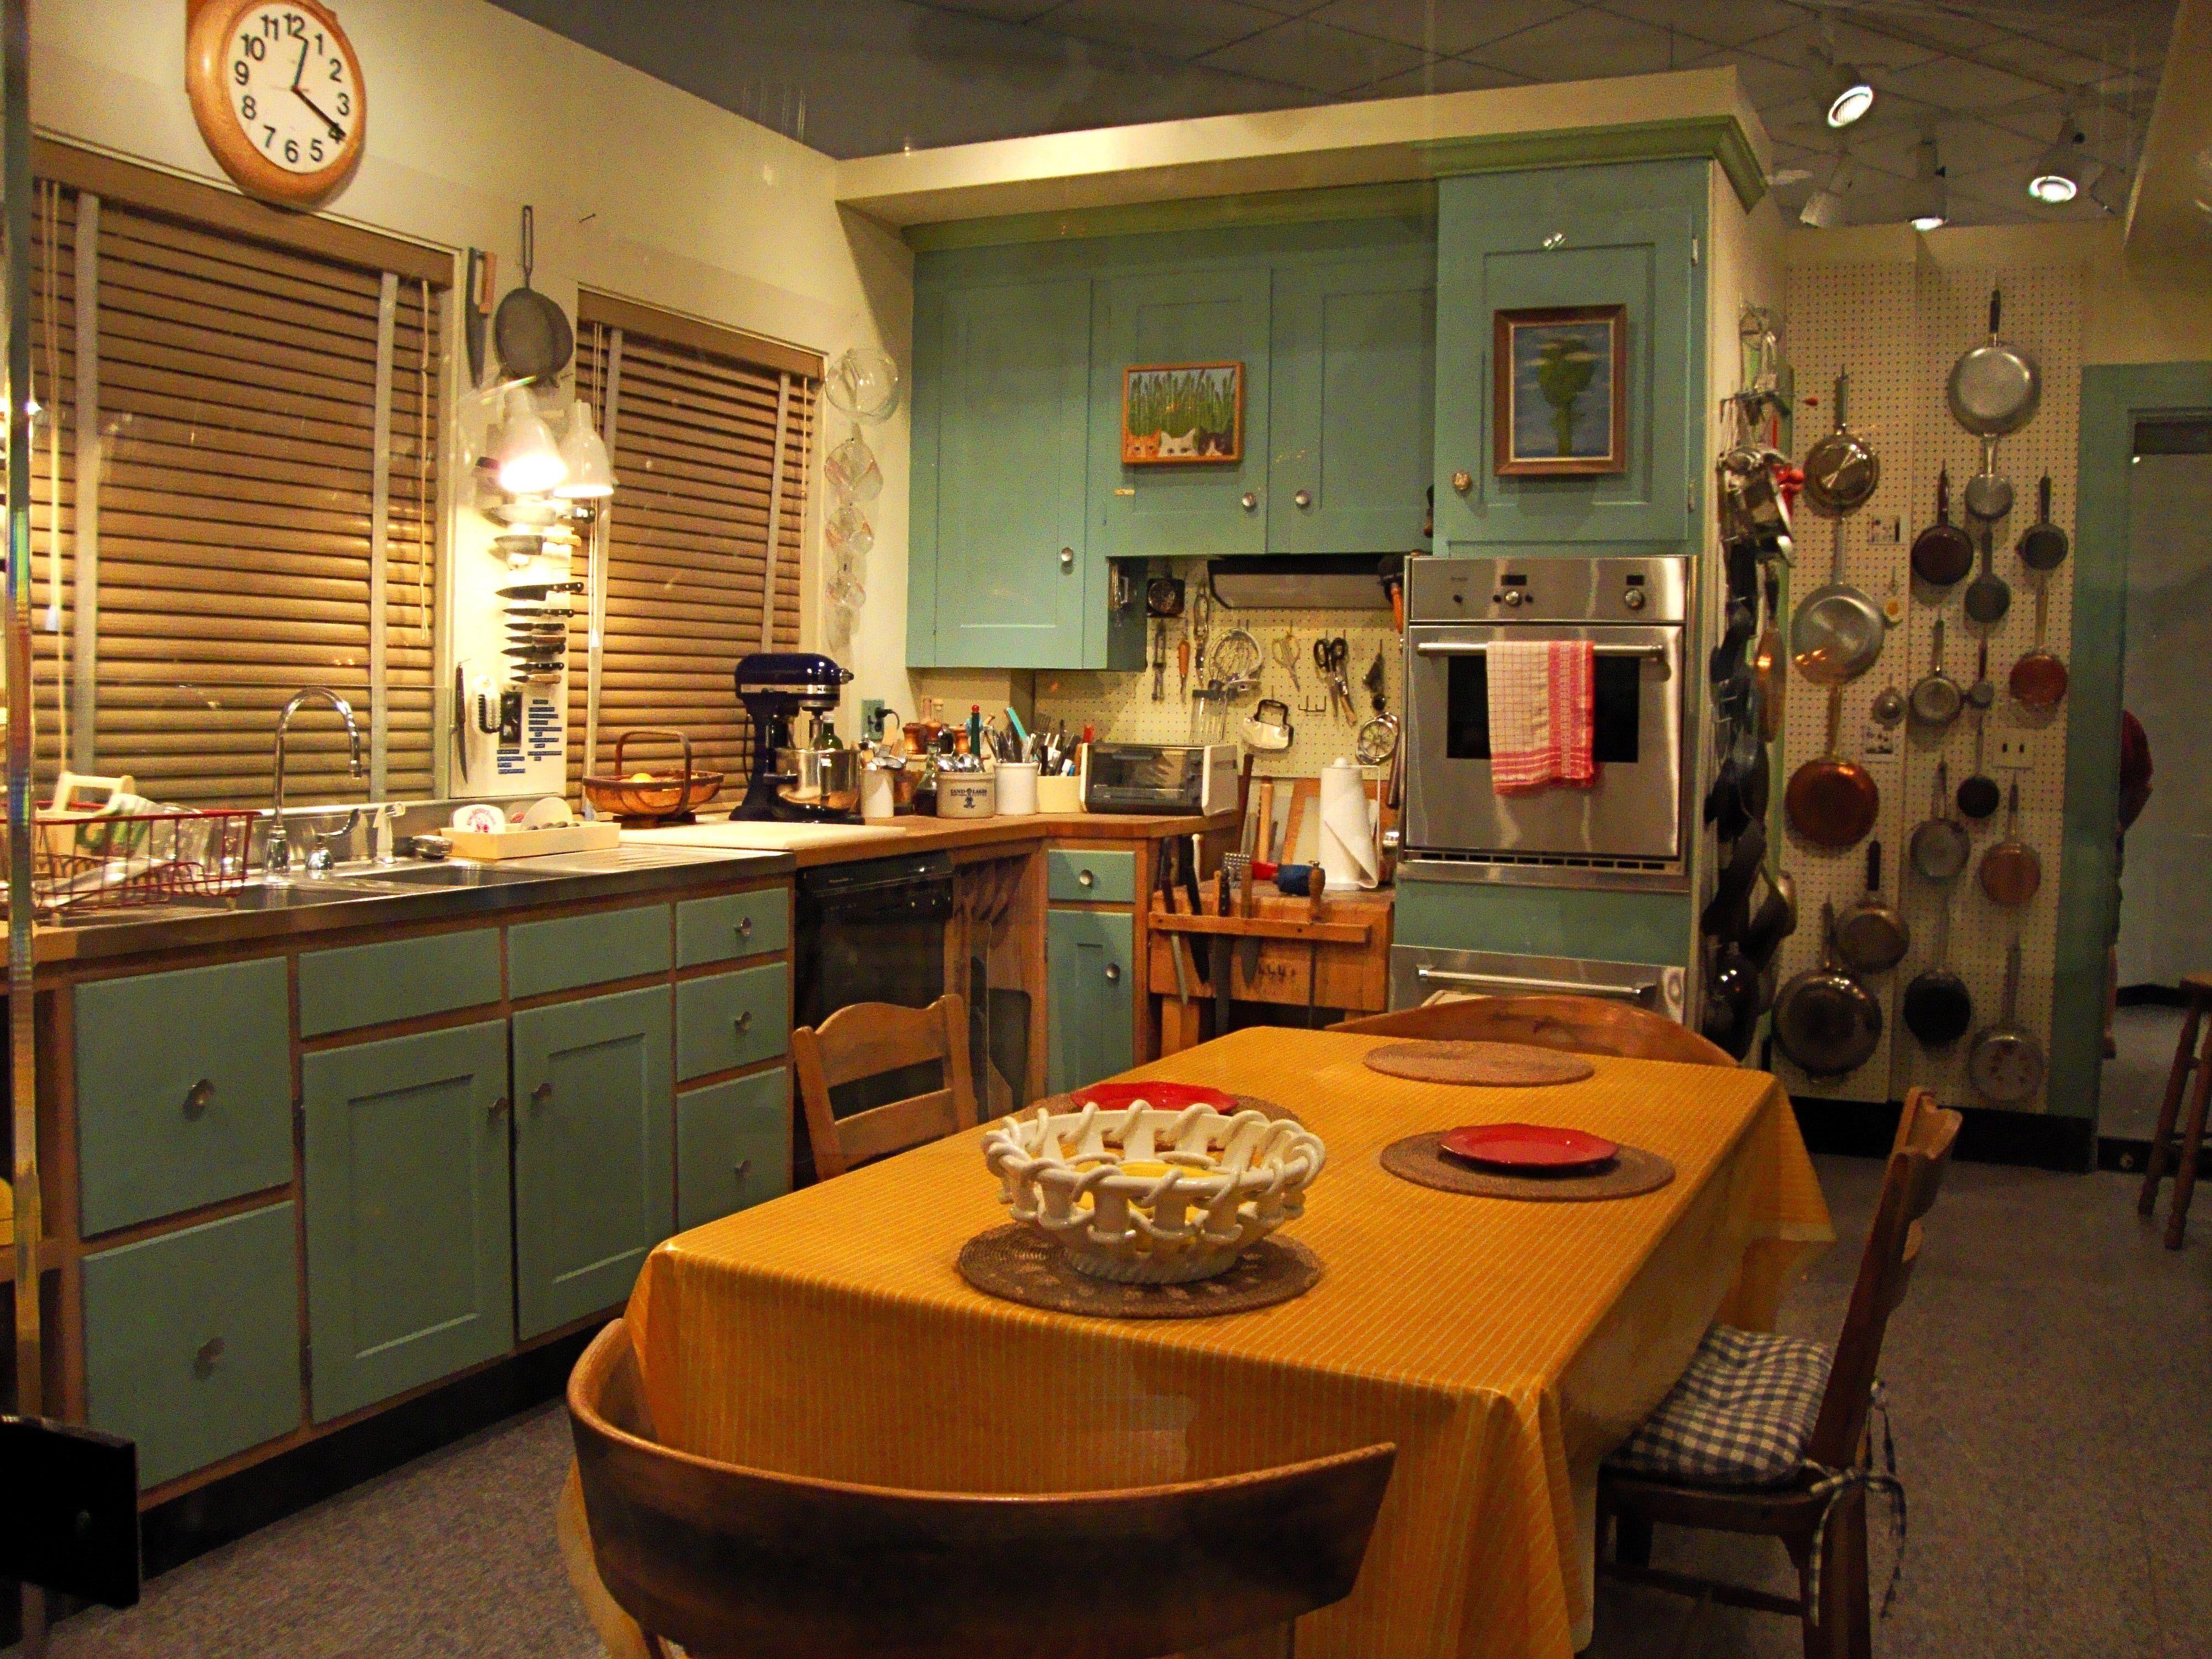 5 Brilliant Ideas To Steal From Julia Child's Kitchen  Kitchen Alluring Kitchen Design Massachusetts Inspiration